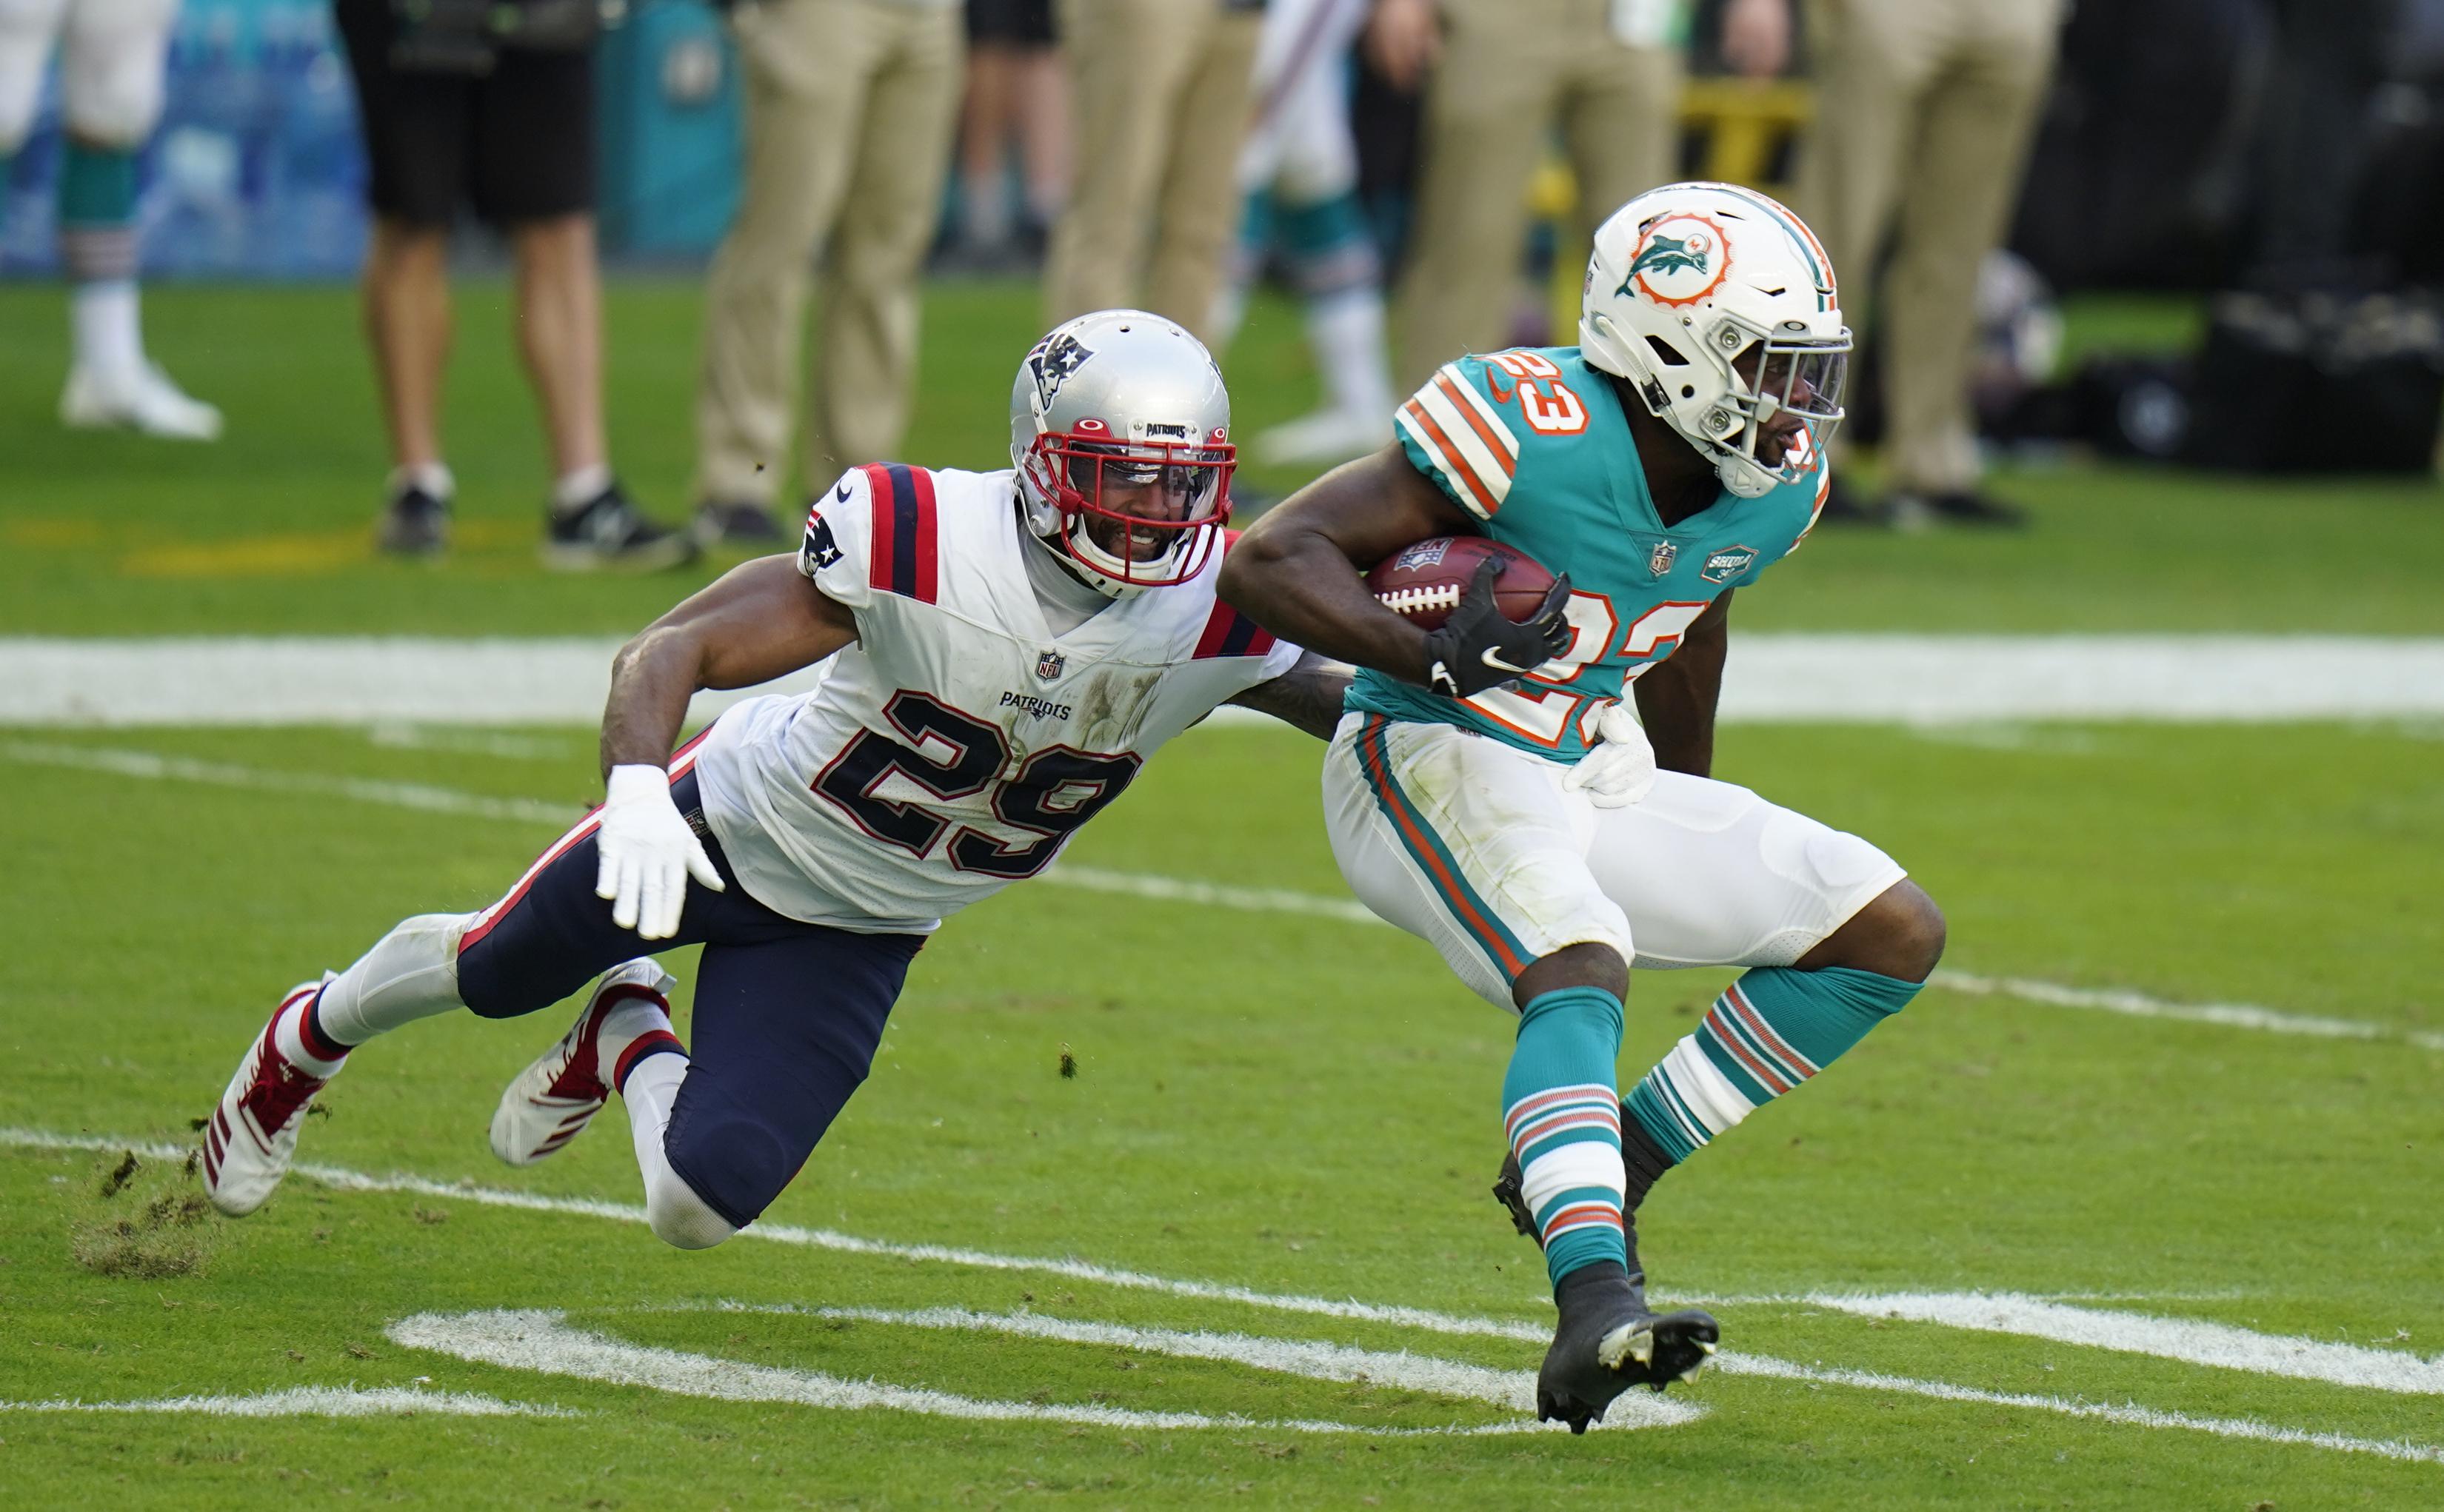 Justin Bethel drummed up 14 tackles for the Patriots last season.